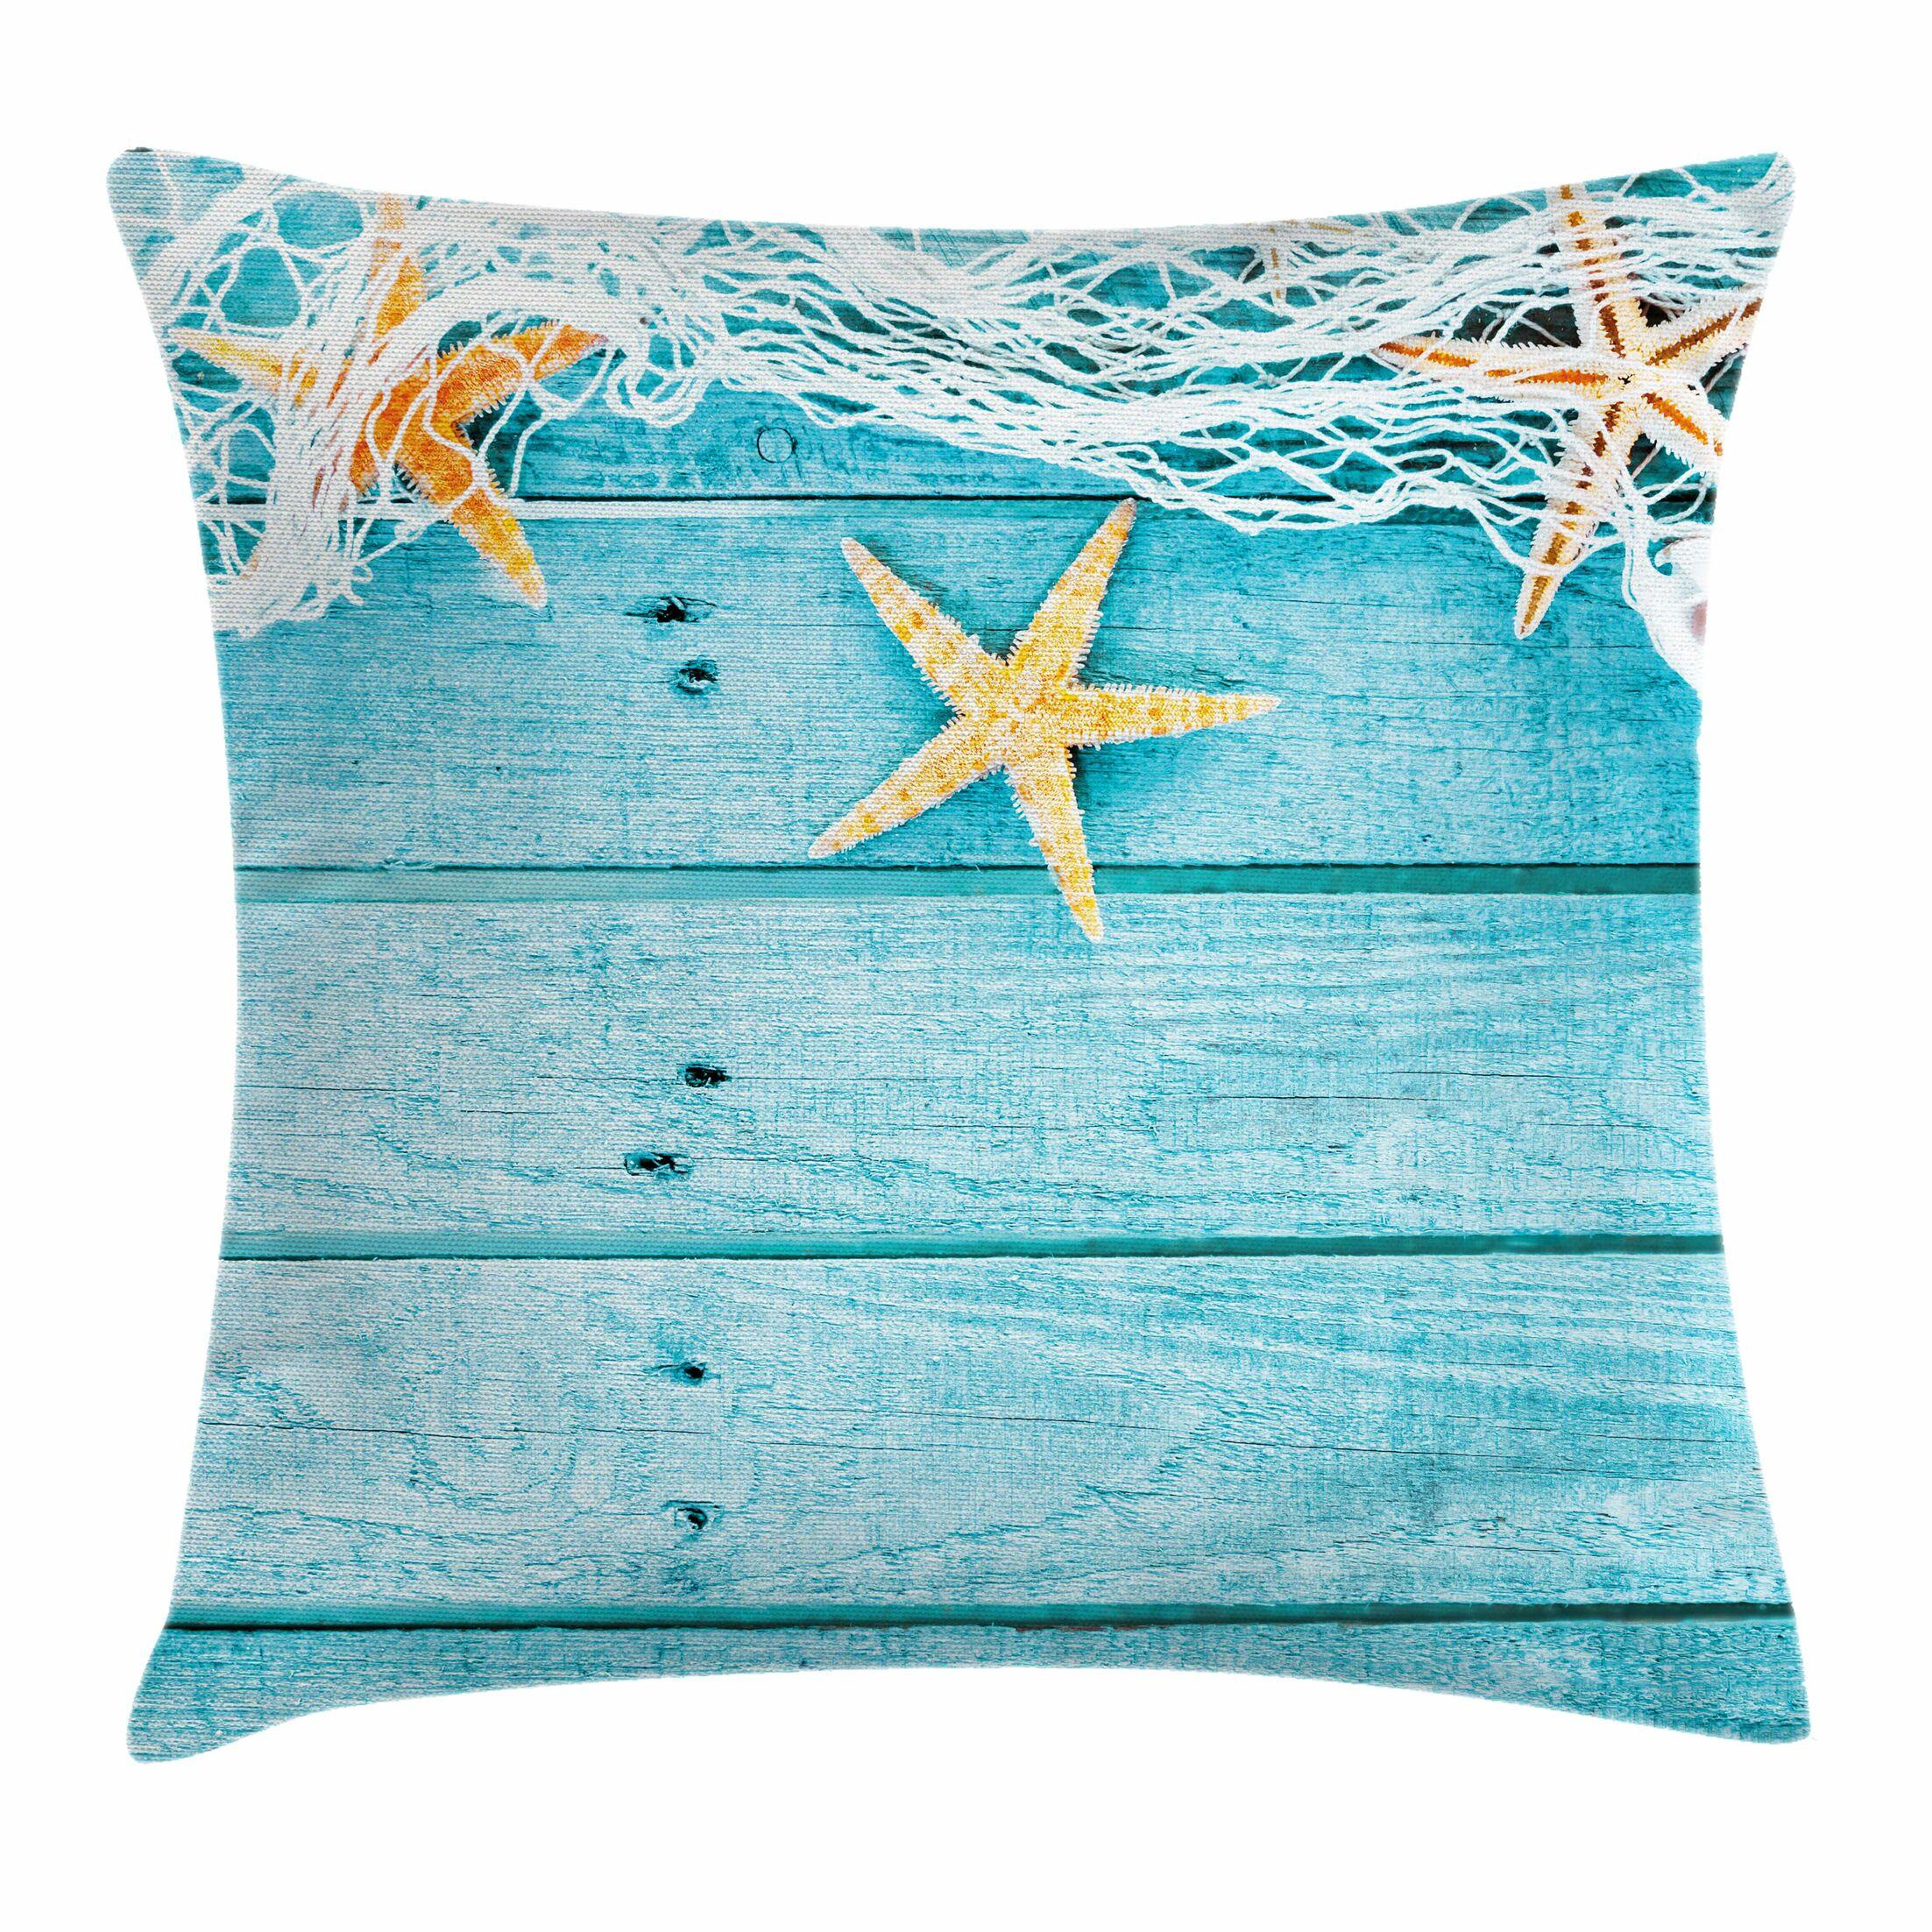 Starfish Decor Rustic Fish Net Square Pillow Cover Size: 20